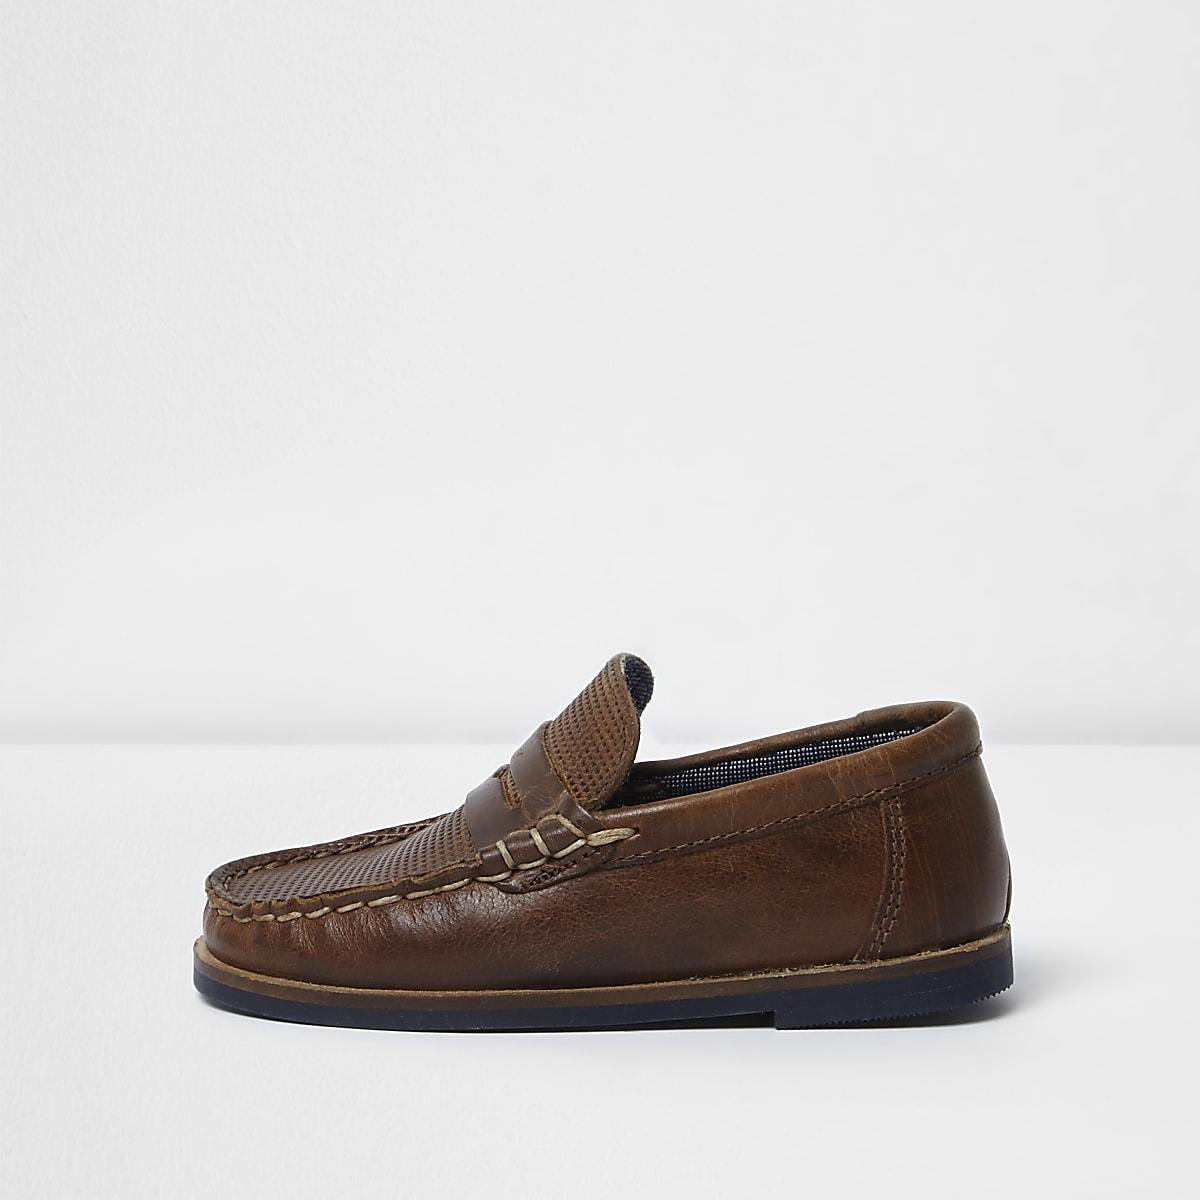 b54b1fd9a4b Mini boys brown leather loafers - Baby Boys Shoes - Baby Boys Shoes   Boots  - Mini Boys - boys